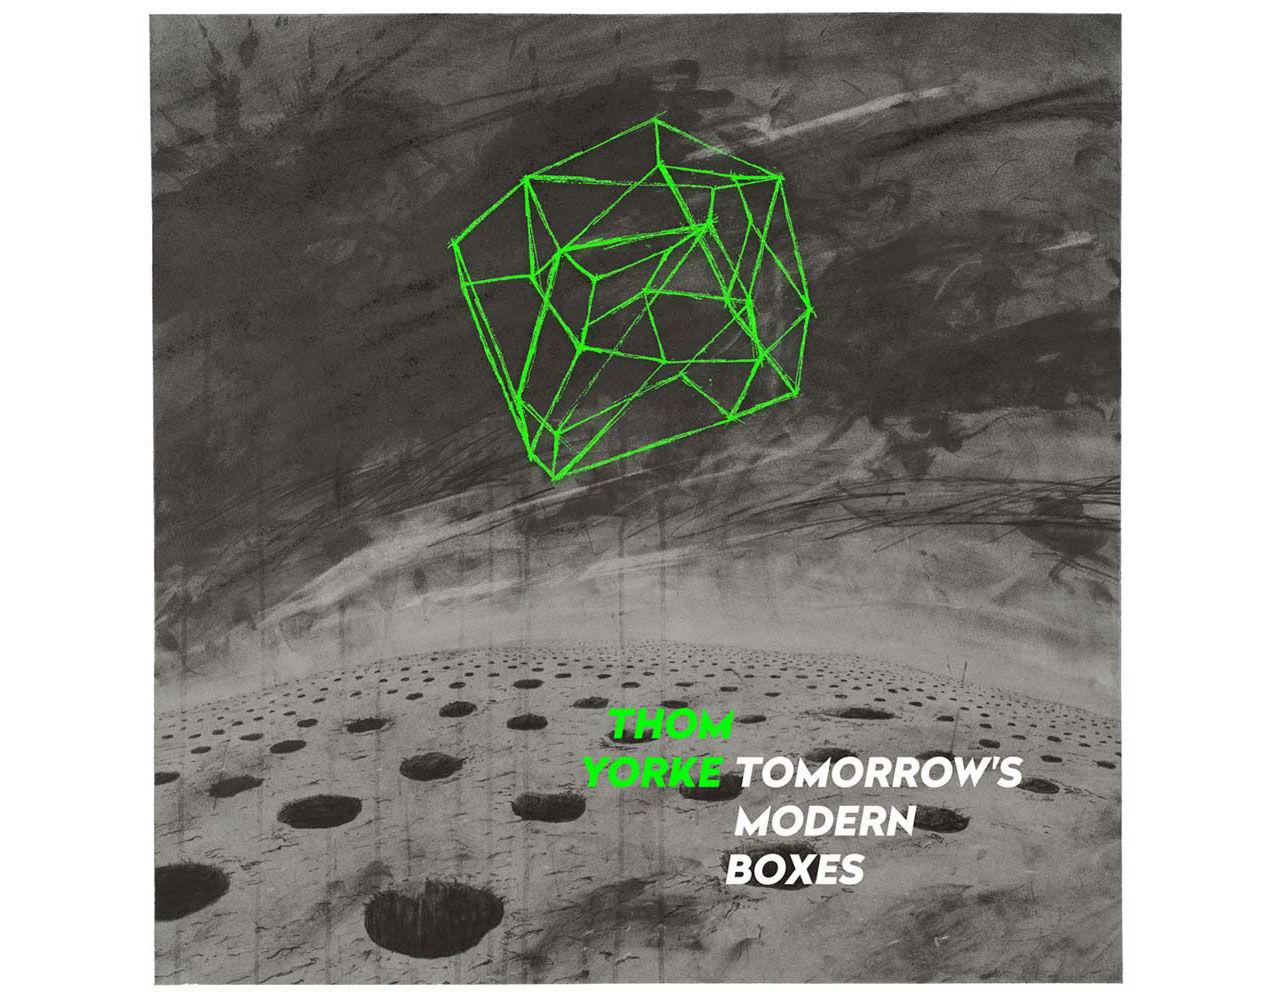 Thom Yorke säljer sitt album via BitTorrent